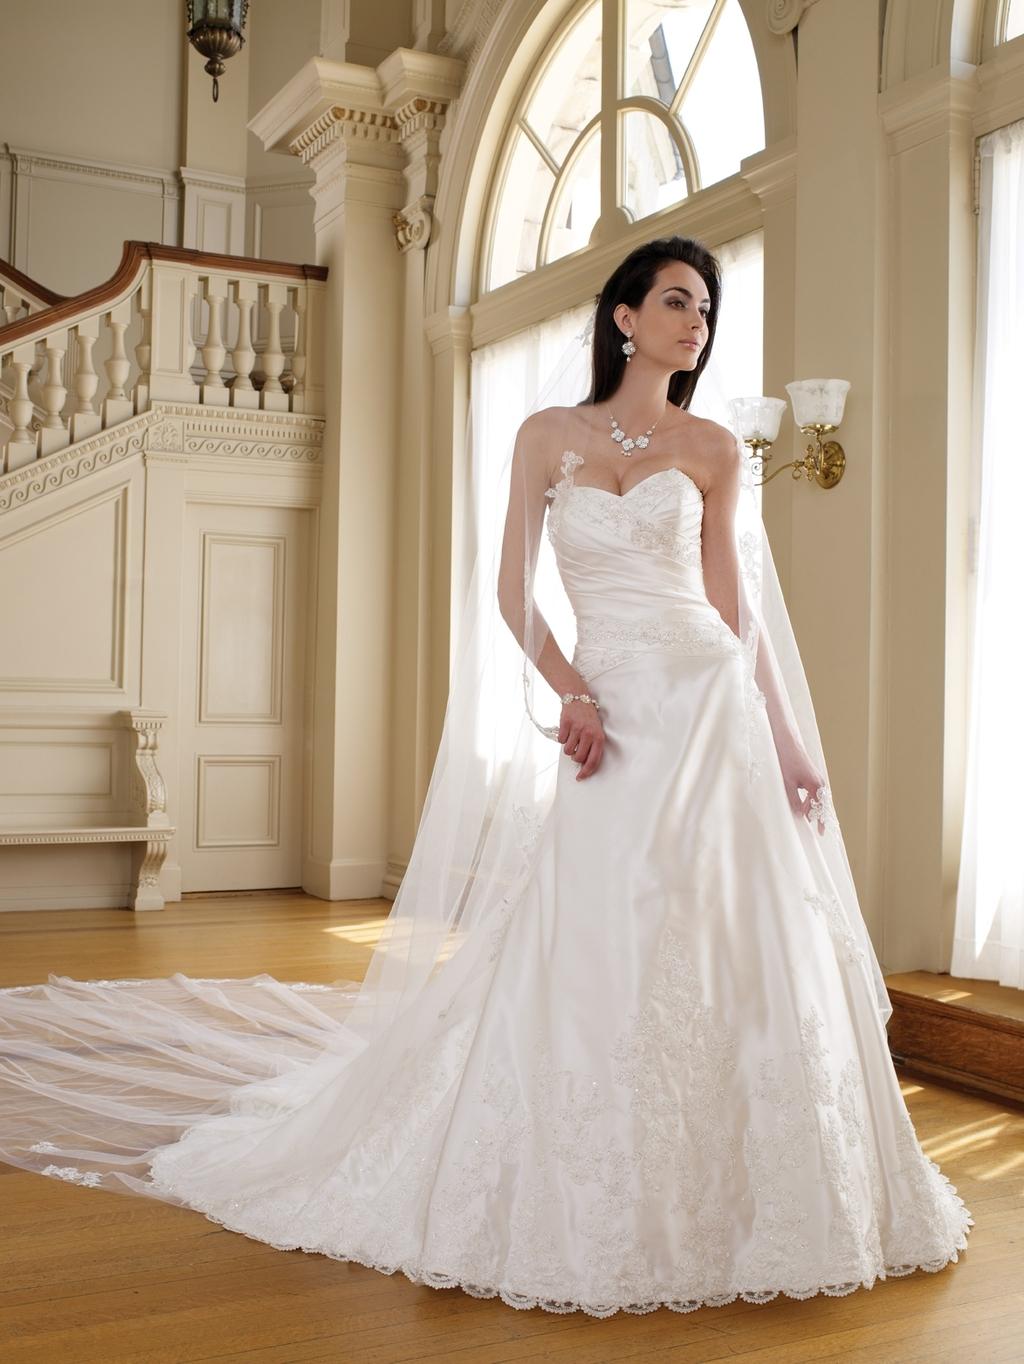 111205_vail-sweetheart-neckline-2011-mon-cheri-wedding-dress-with-veil.full